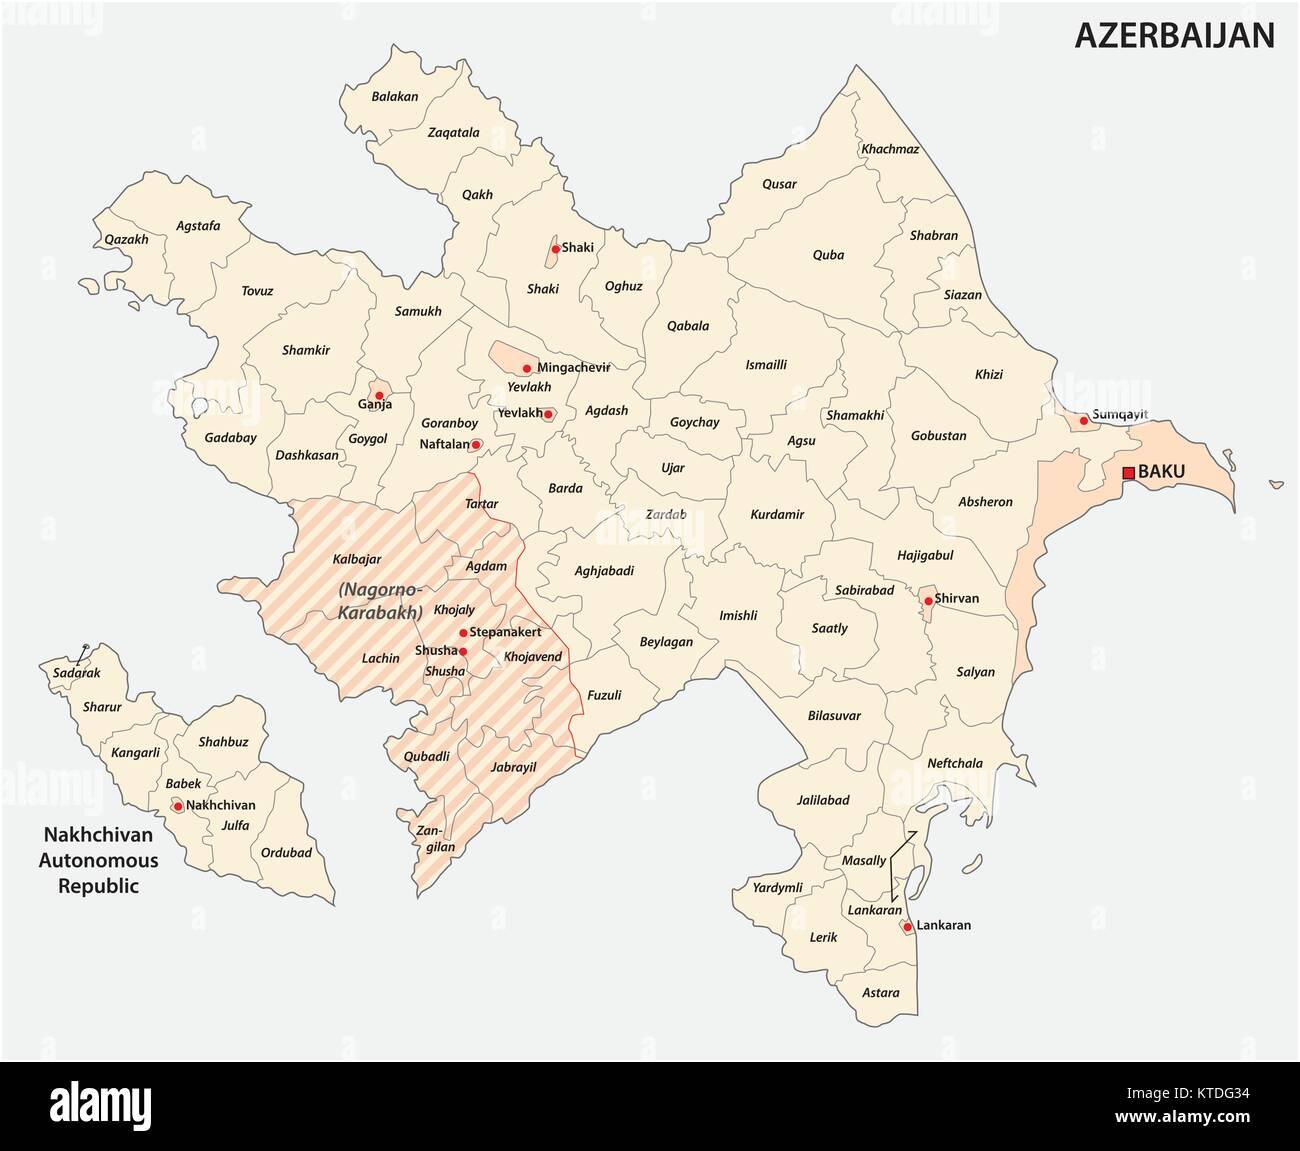 Baku Aserbaidschan Karte.Azerbaijan Map Vector Stockfotos Azerbaijan Map Vector